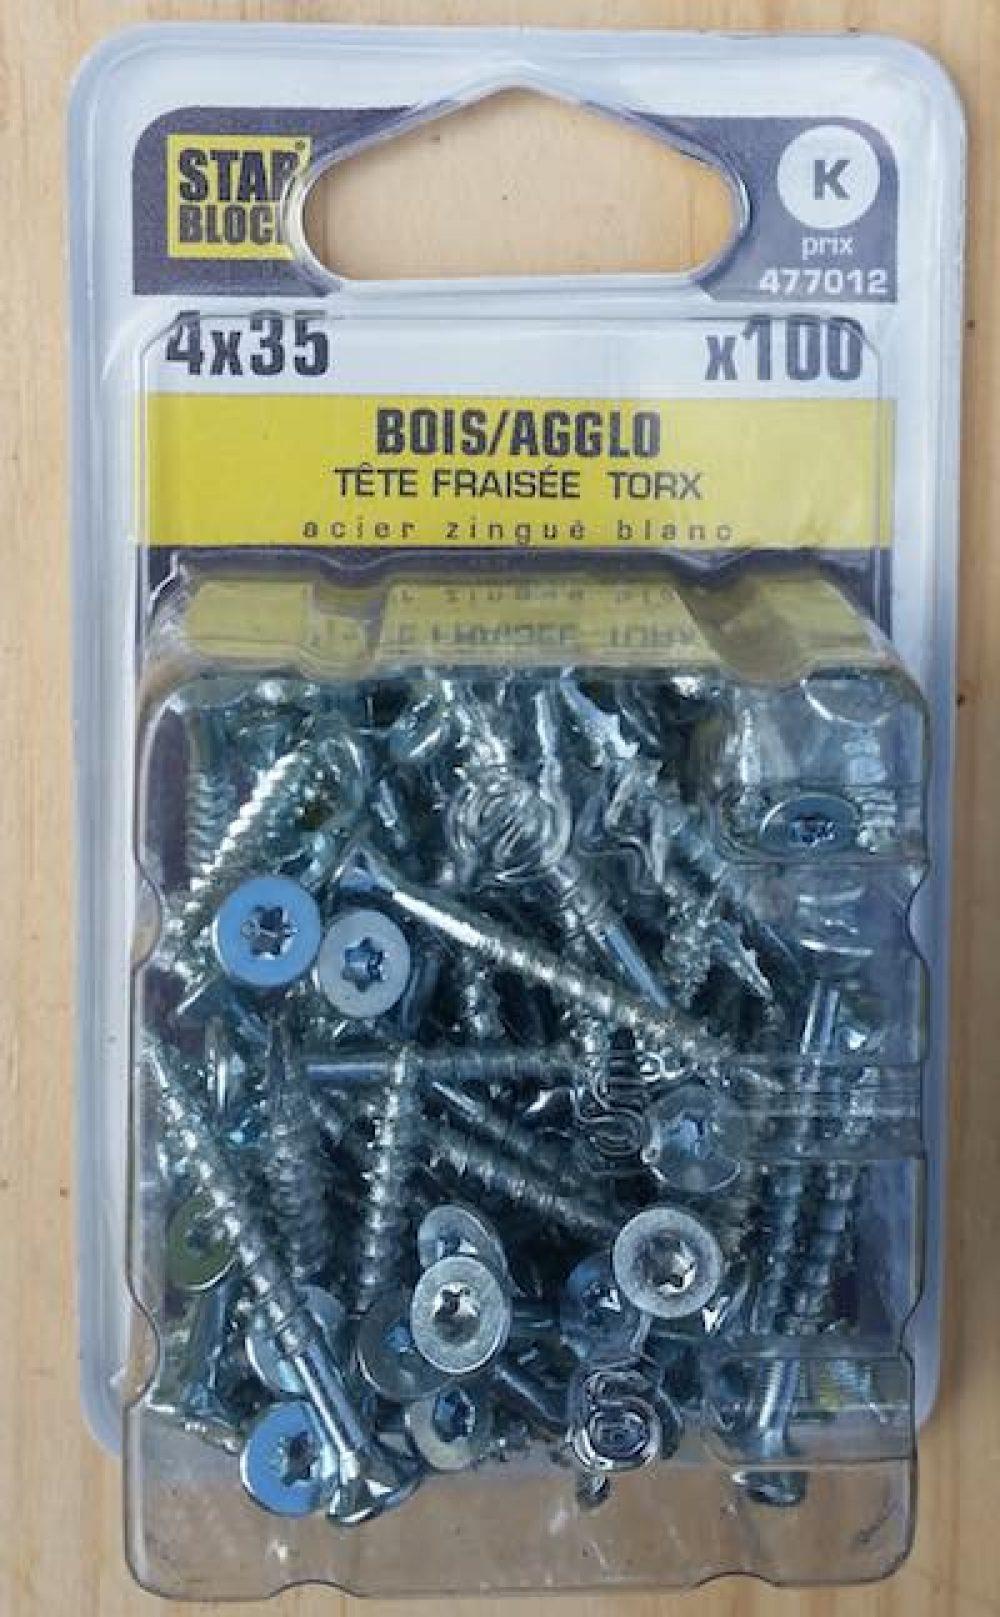 vis boite de 100 vis acier tete fraisee torx starblock 4x30mm 4x35mm